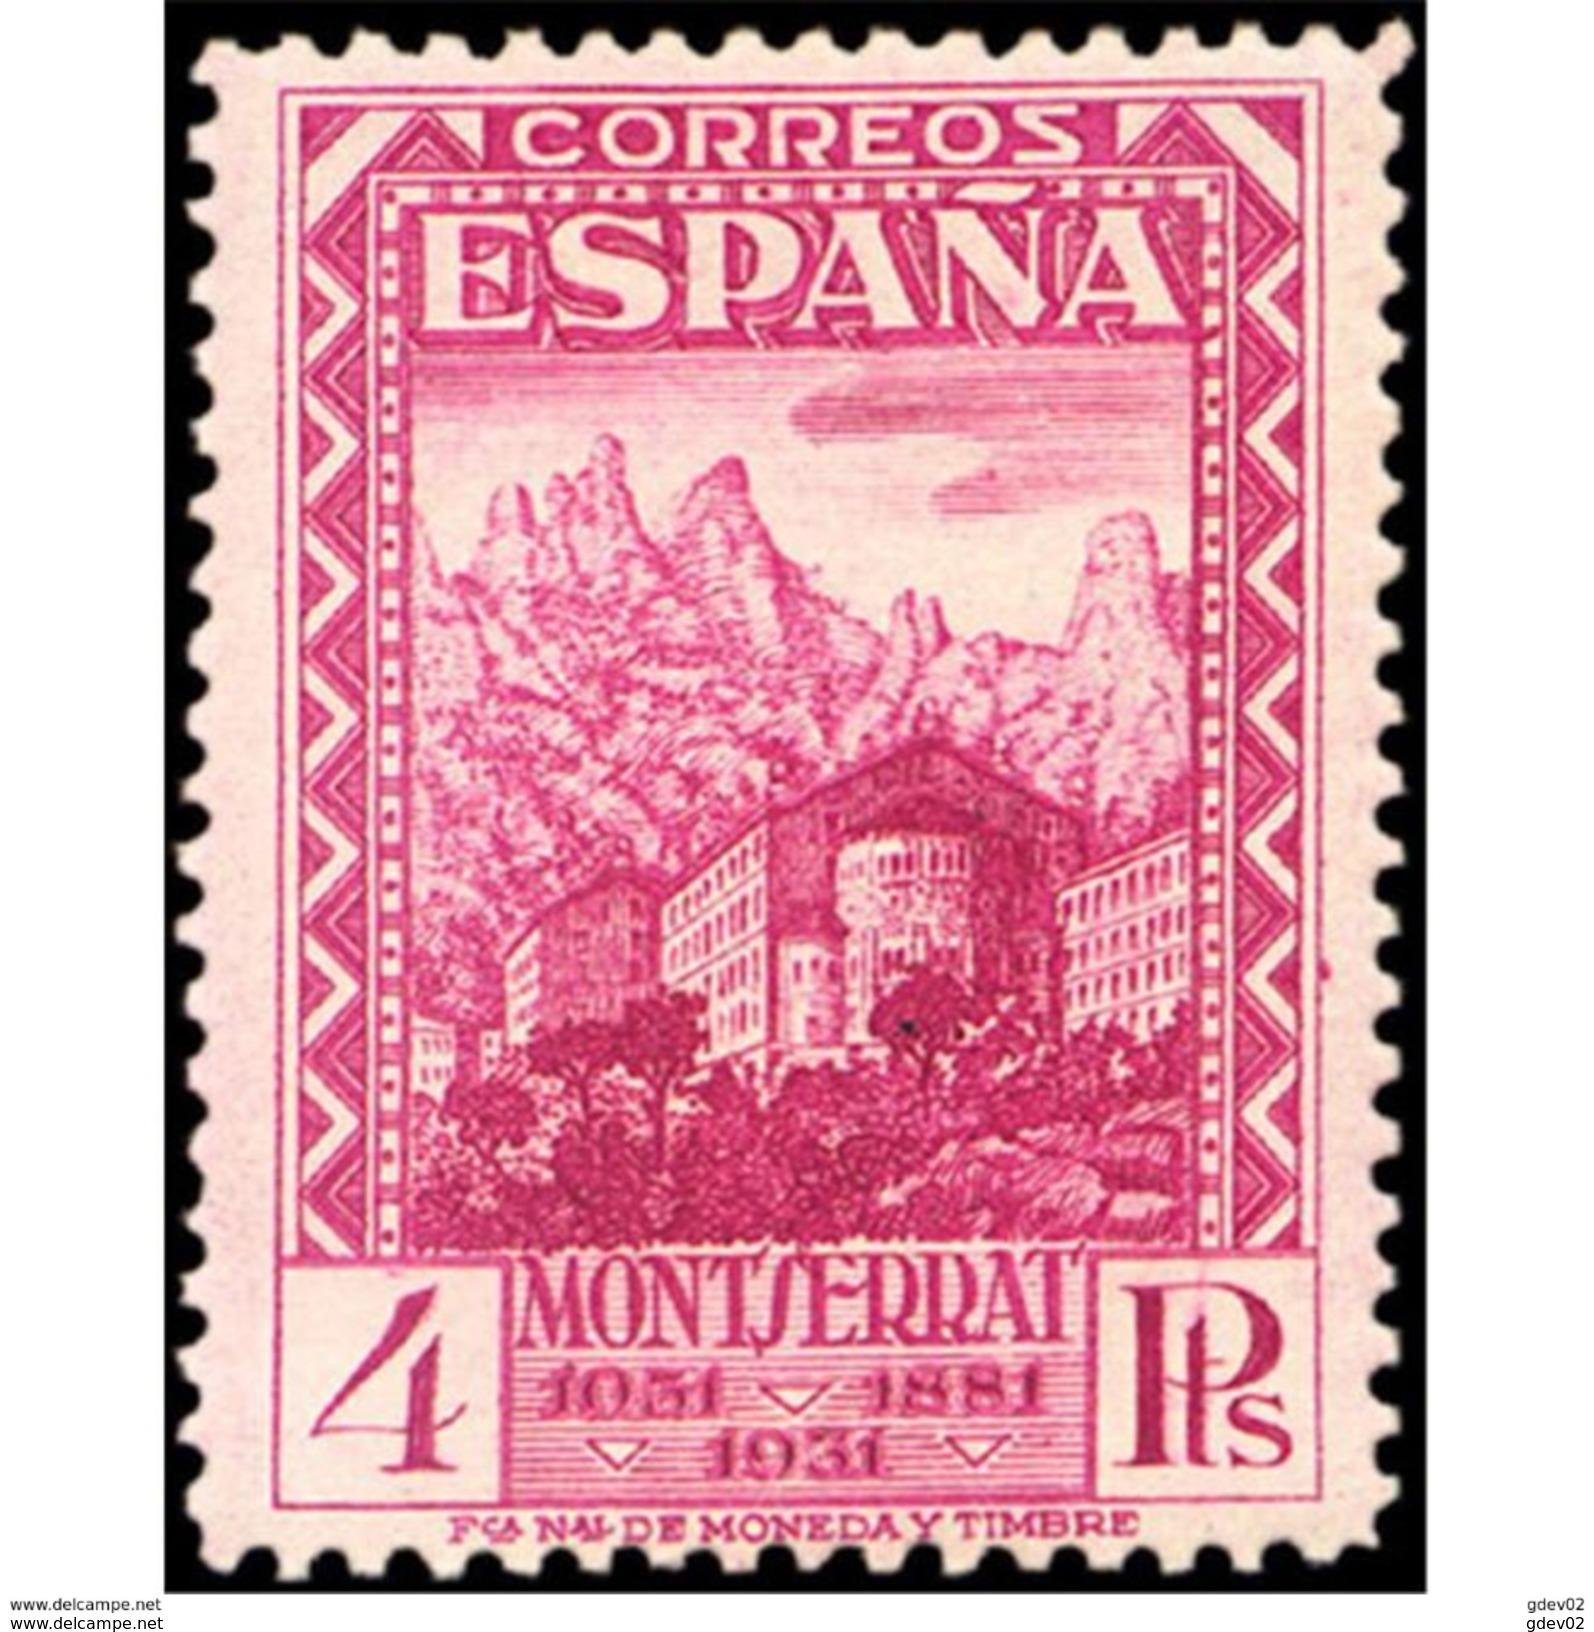 ES647STV-LTV***647STRCRI.Spain.Esgane.Monasterio De La VIRGEN DE MONTSERRAT 1931 (Ed 647**) - Cristianismo